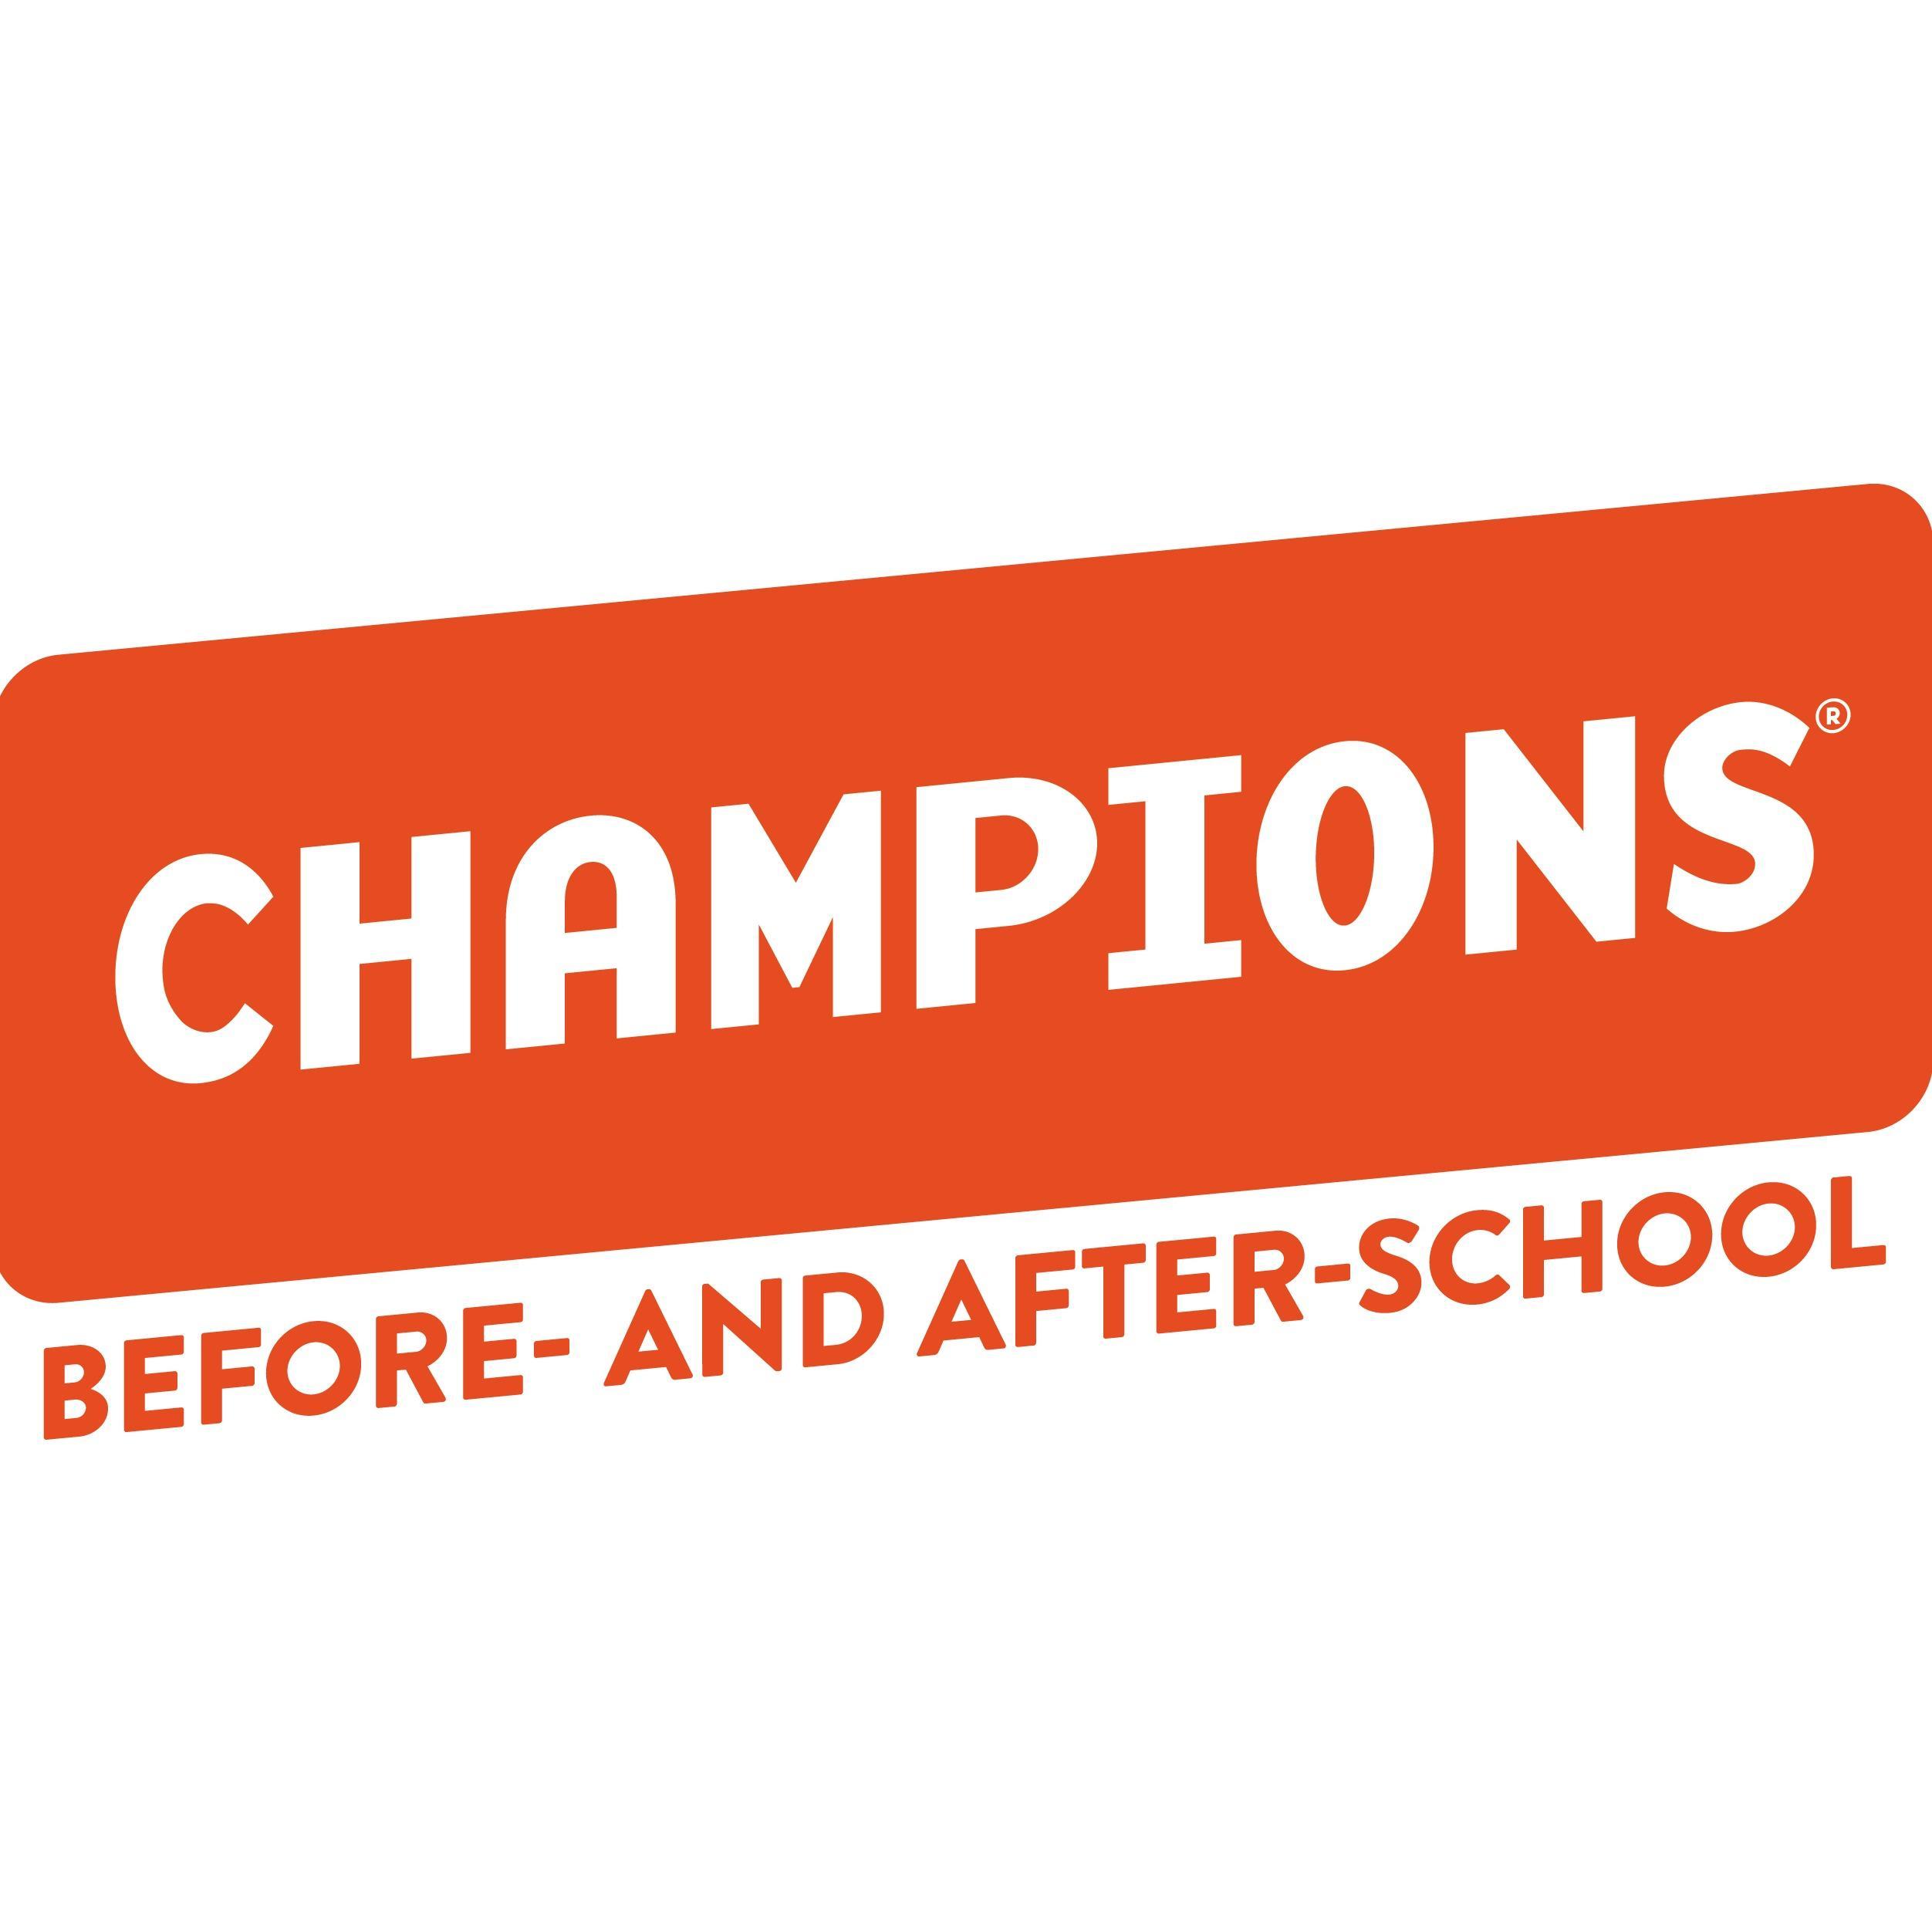 Champions at Bridger Elementary Kindergarten Center   7100 SE Division St, Portland, OR, 97206   +1 (971) 212-3639